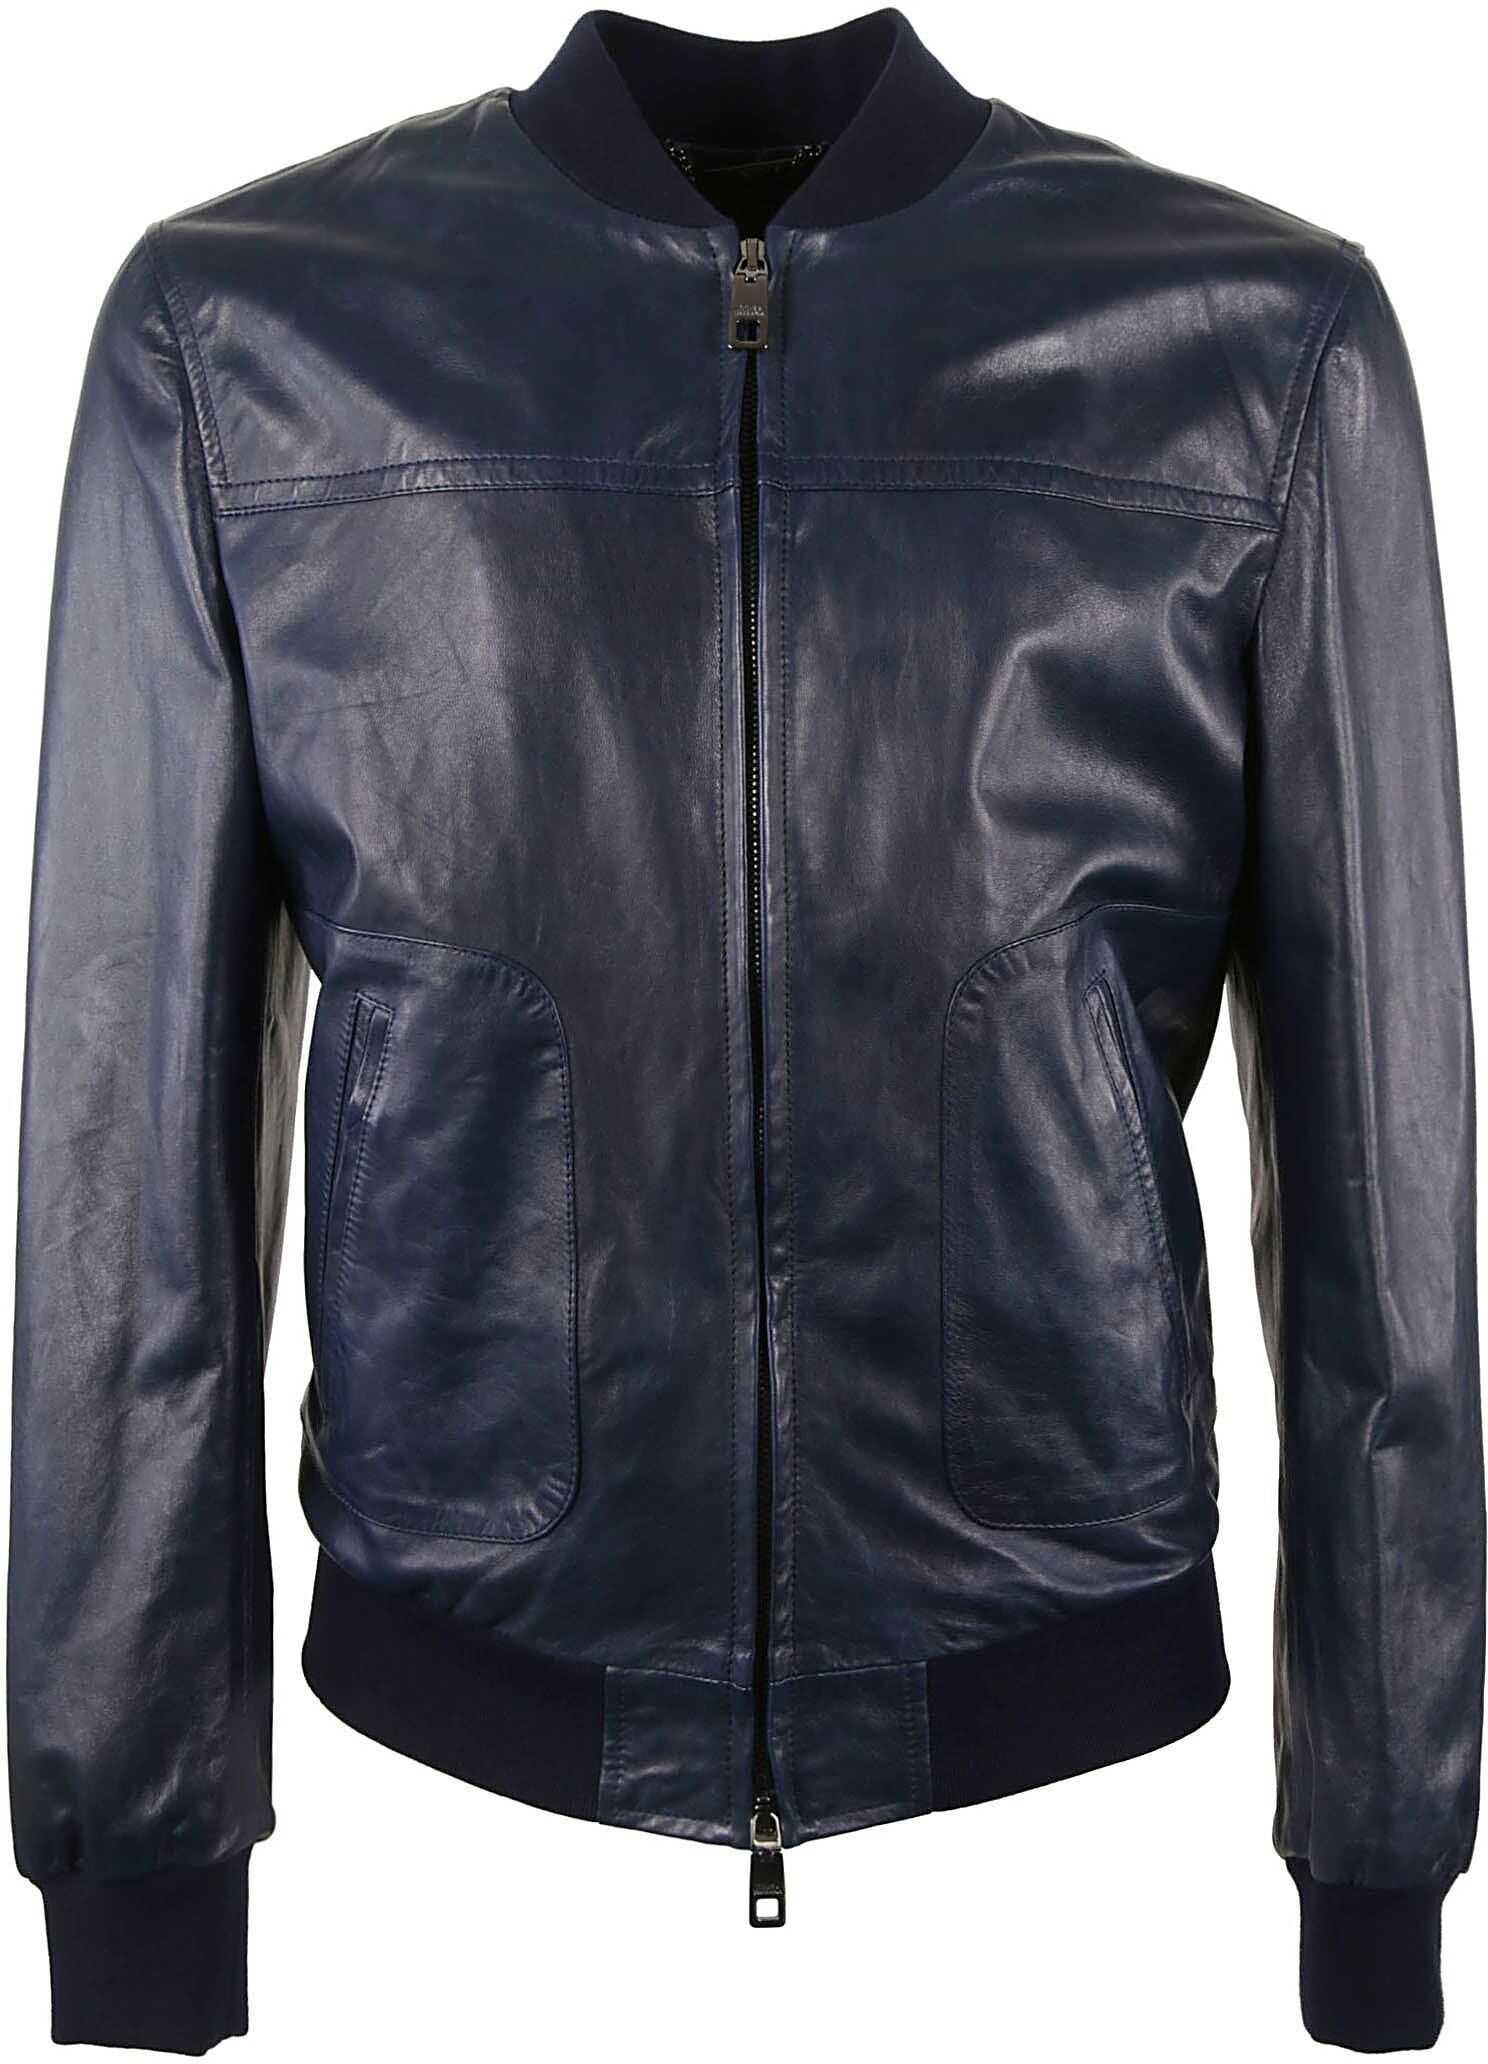 Dolce & Gabbana Leather Outerwear Jacket BLUE